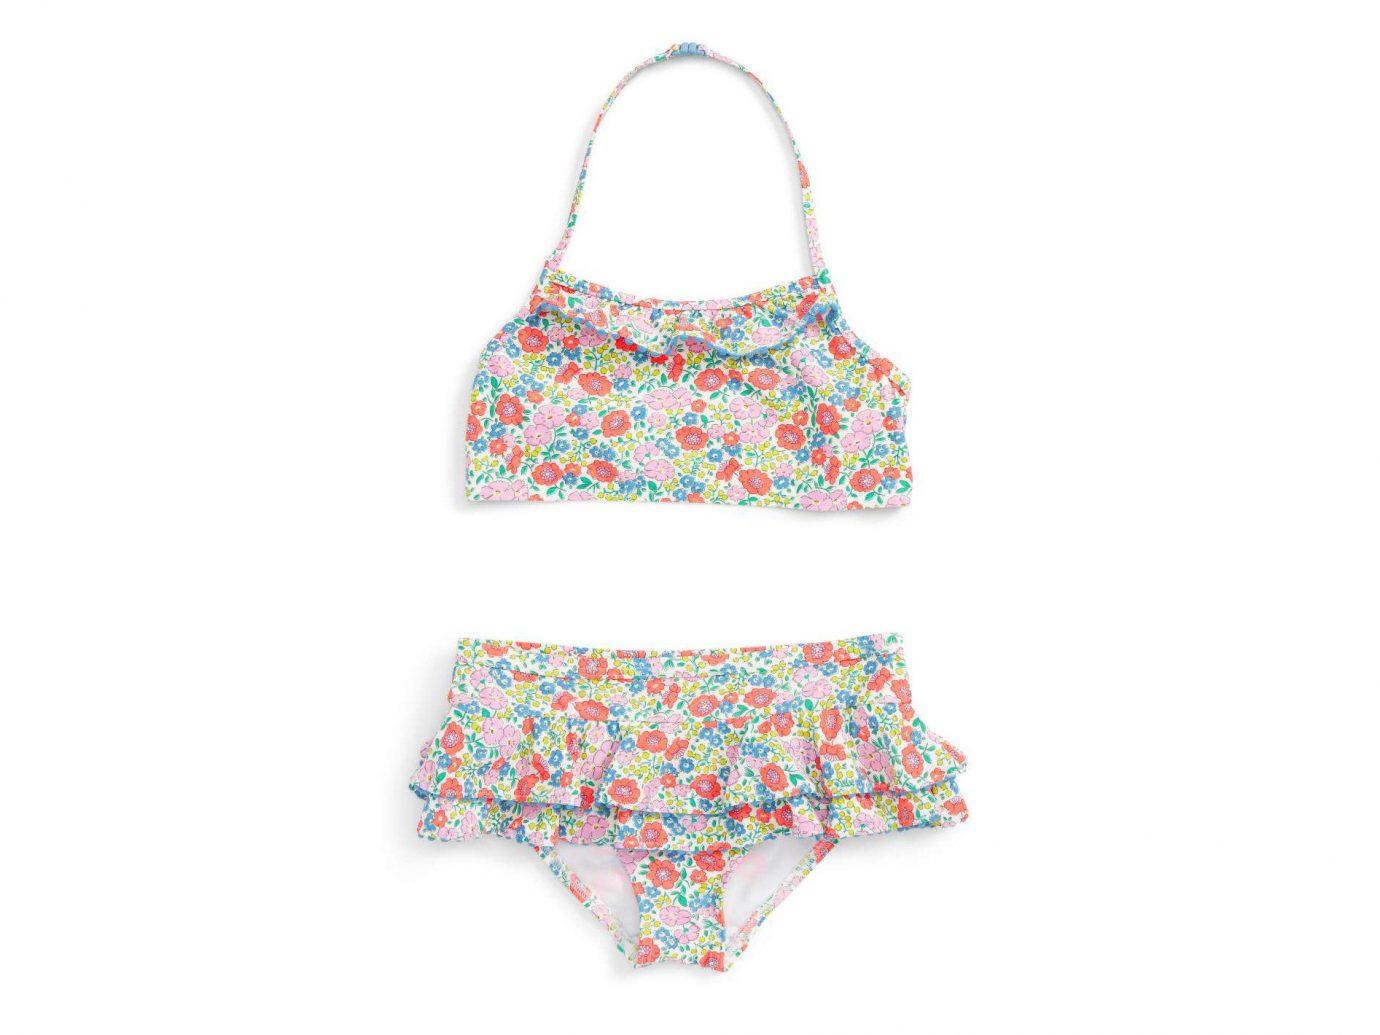 Style + Design clothing product swimwear bag shoulder bag handbag swimsuit top swimsuit bottom Design pattern one piece swimsuit